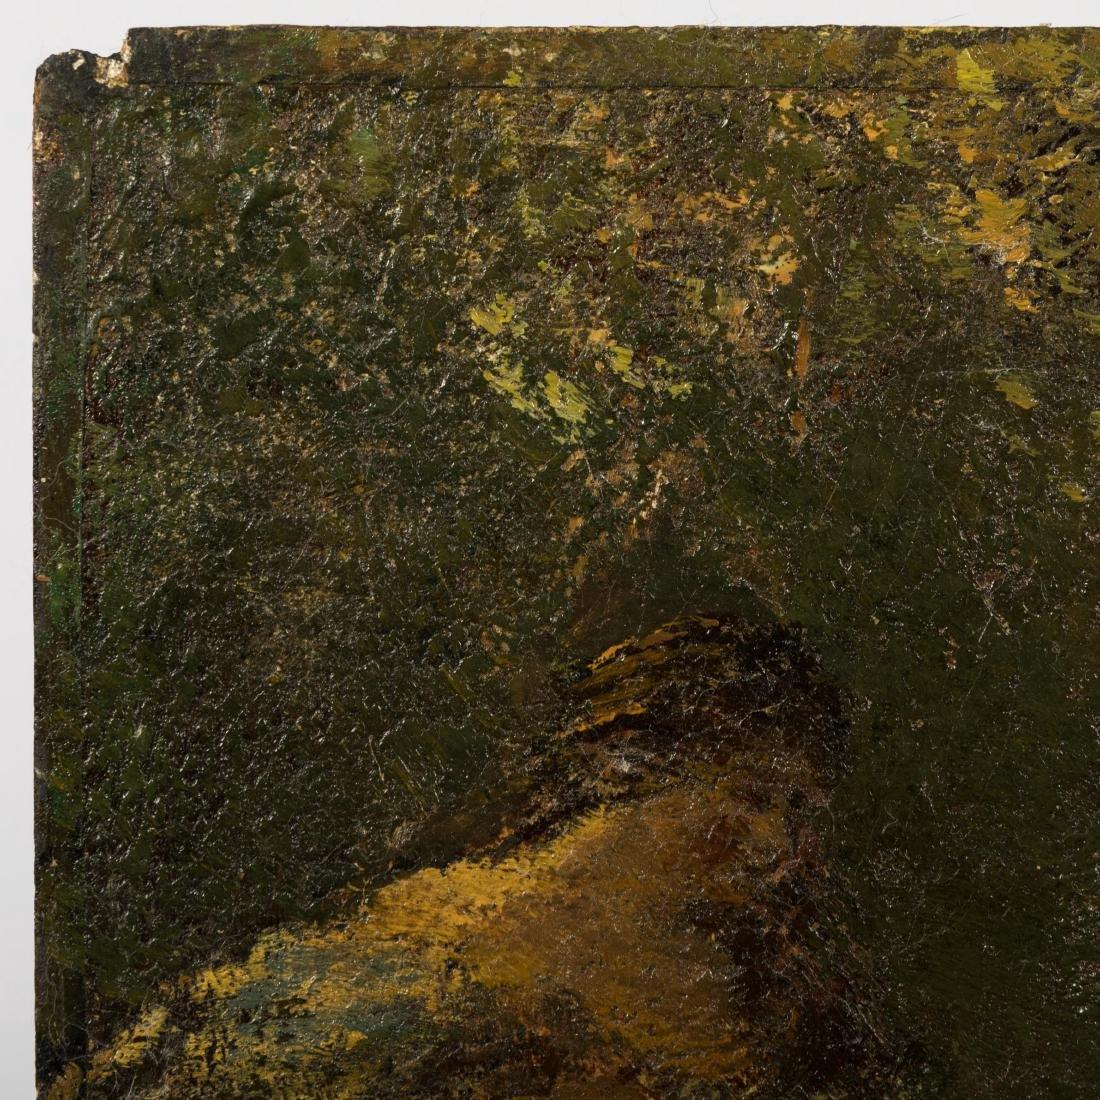 Frederick Ballard Williams - Oil on Board - 5